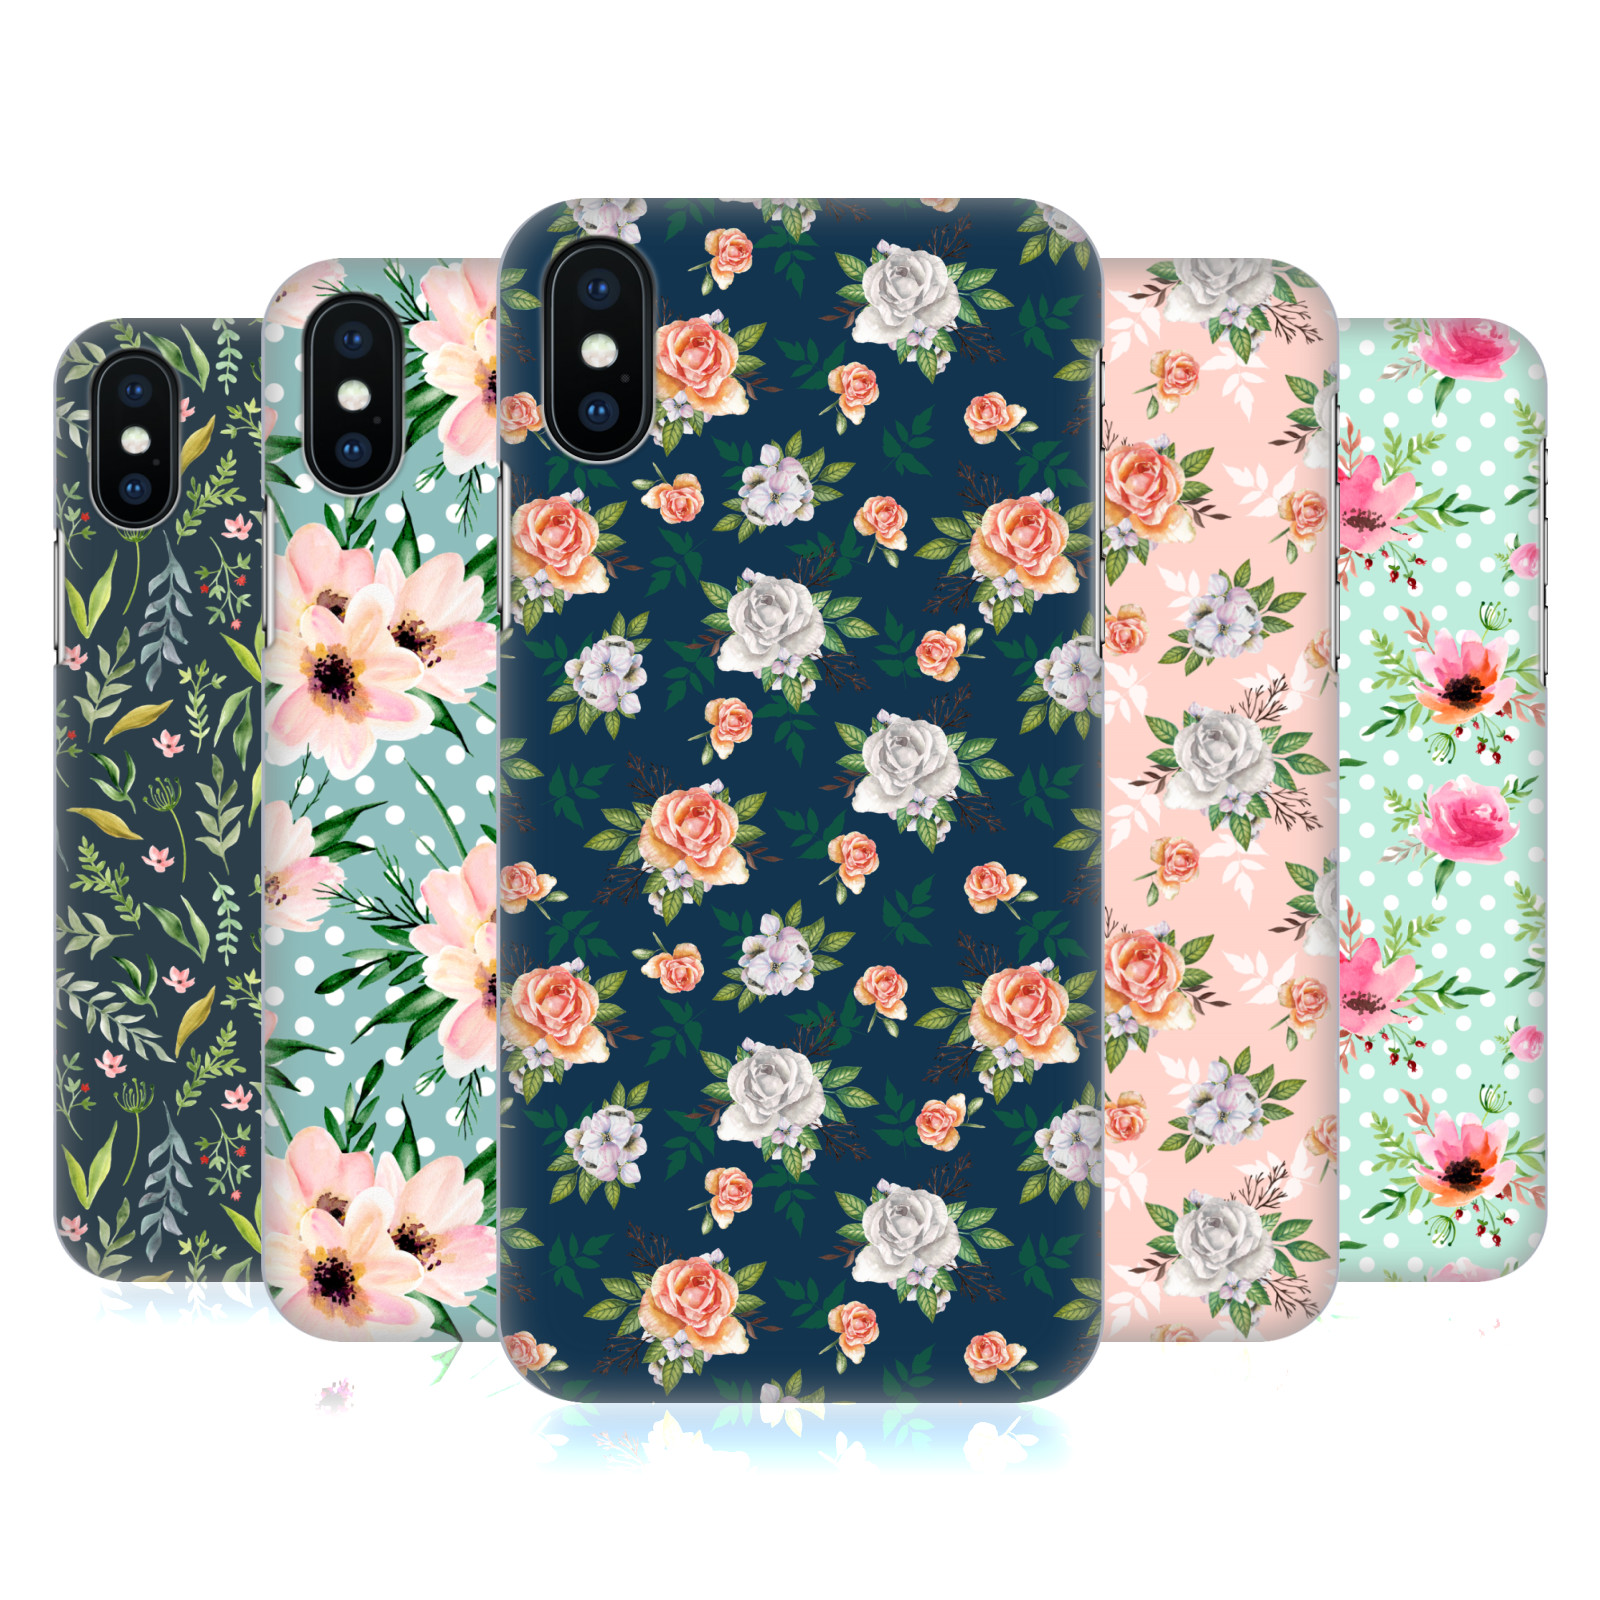 Julia Badeeva  Floral Patterns